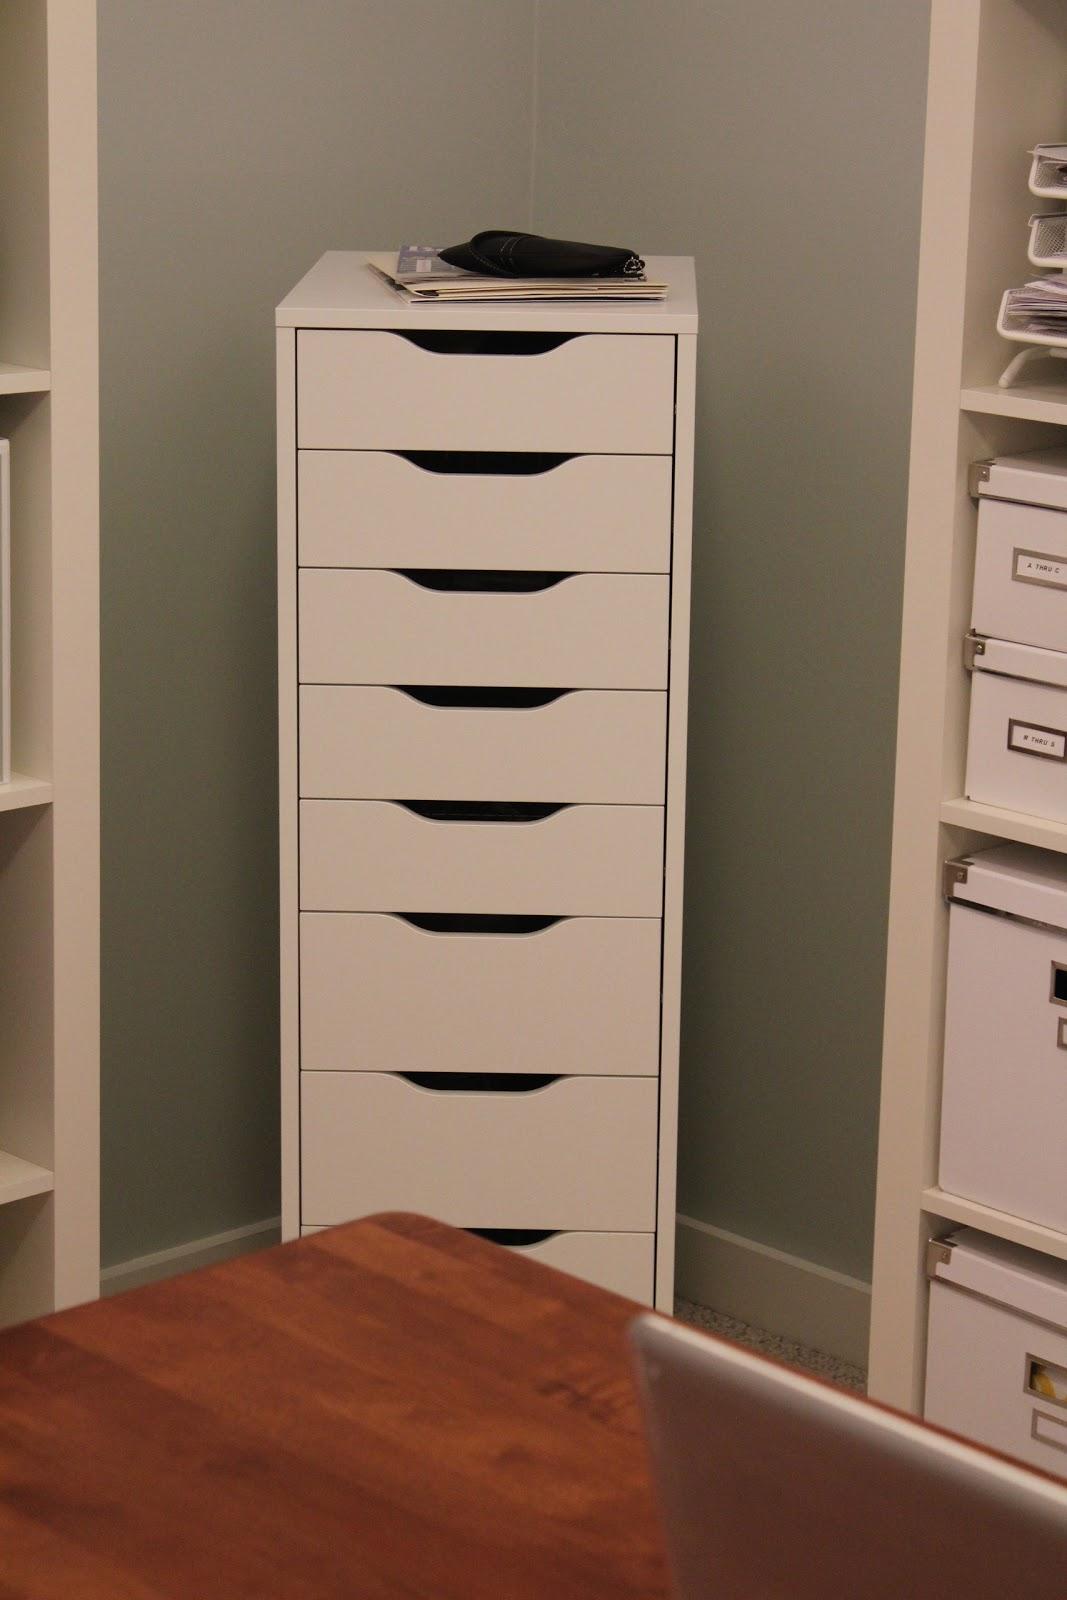 Pine Tree Home: Office: IKEA Alex Storage Drawers